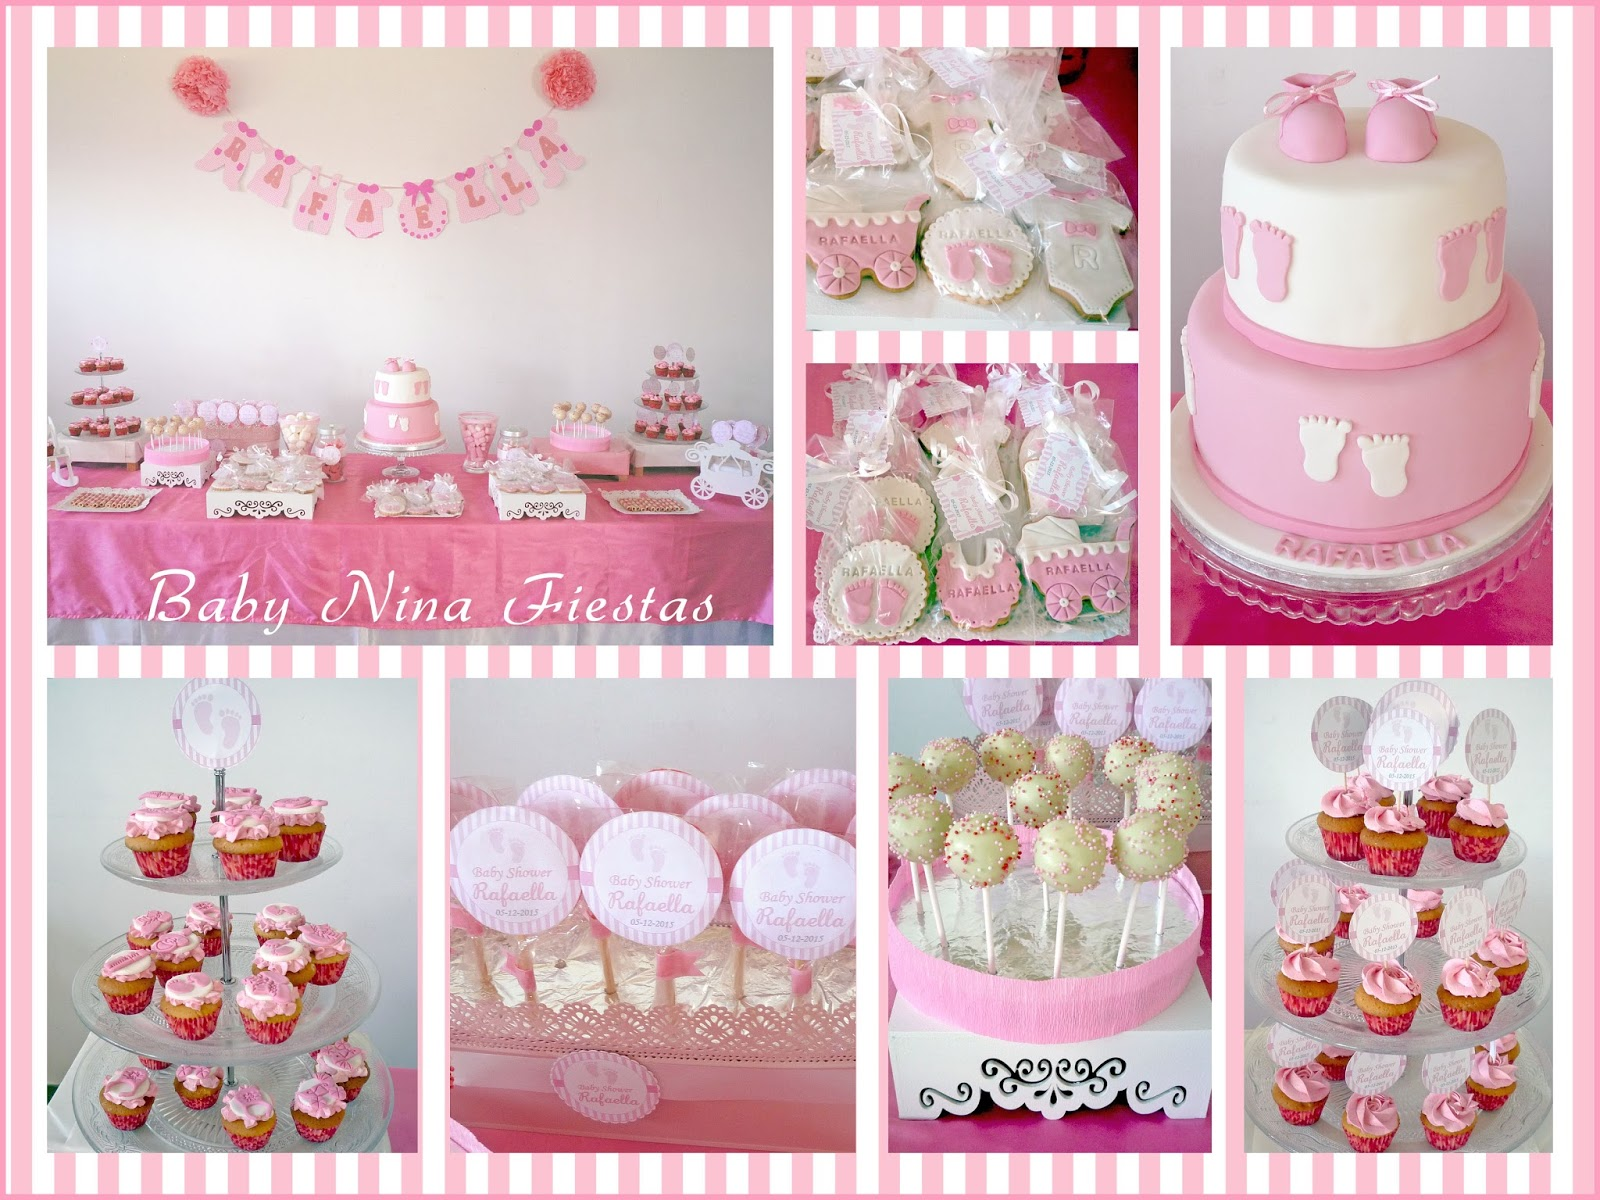 Baby nina fiestas baby shower rafaella - Decoracion fiesta rosa ...